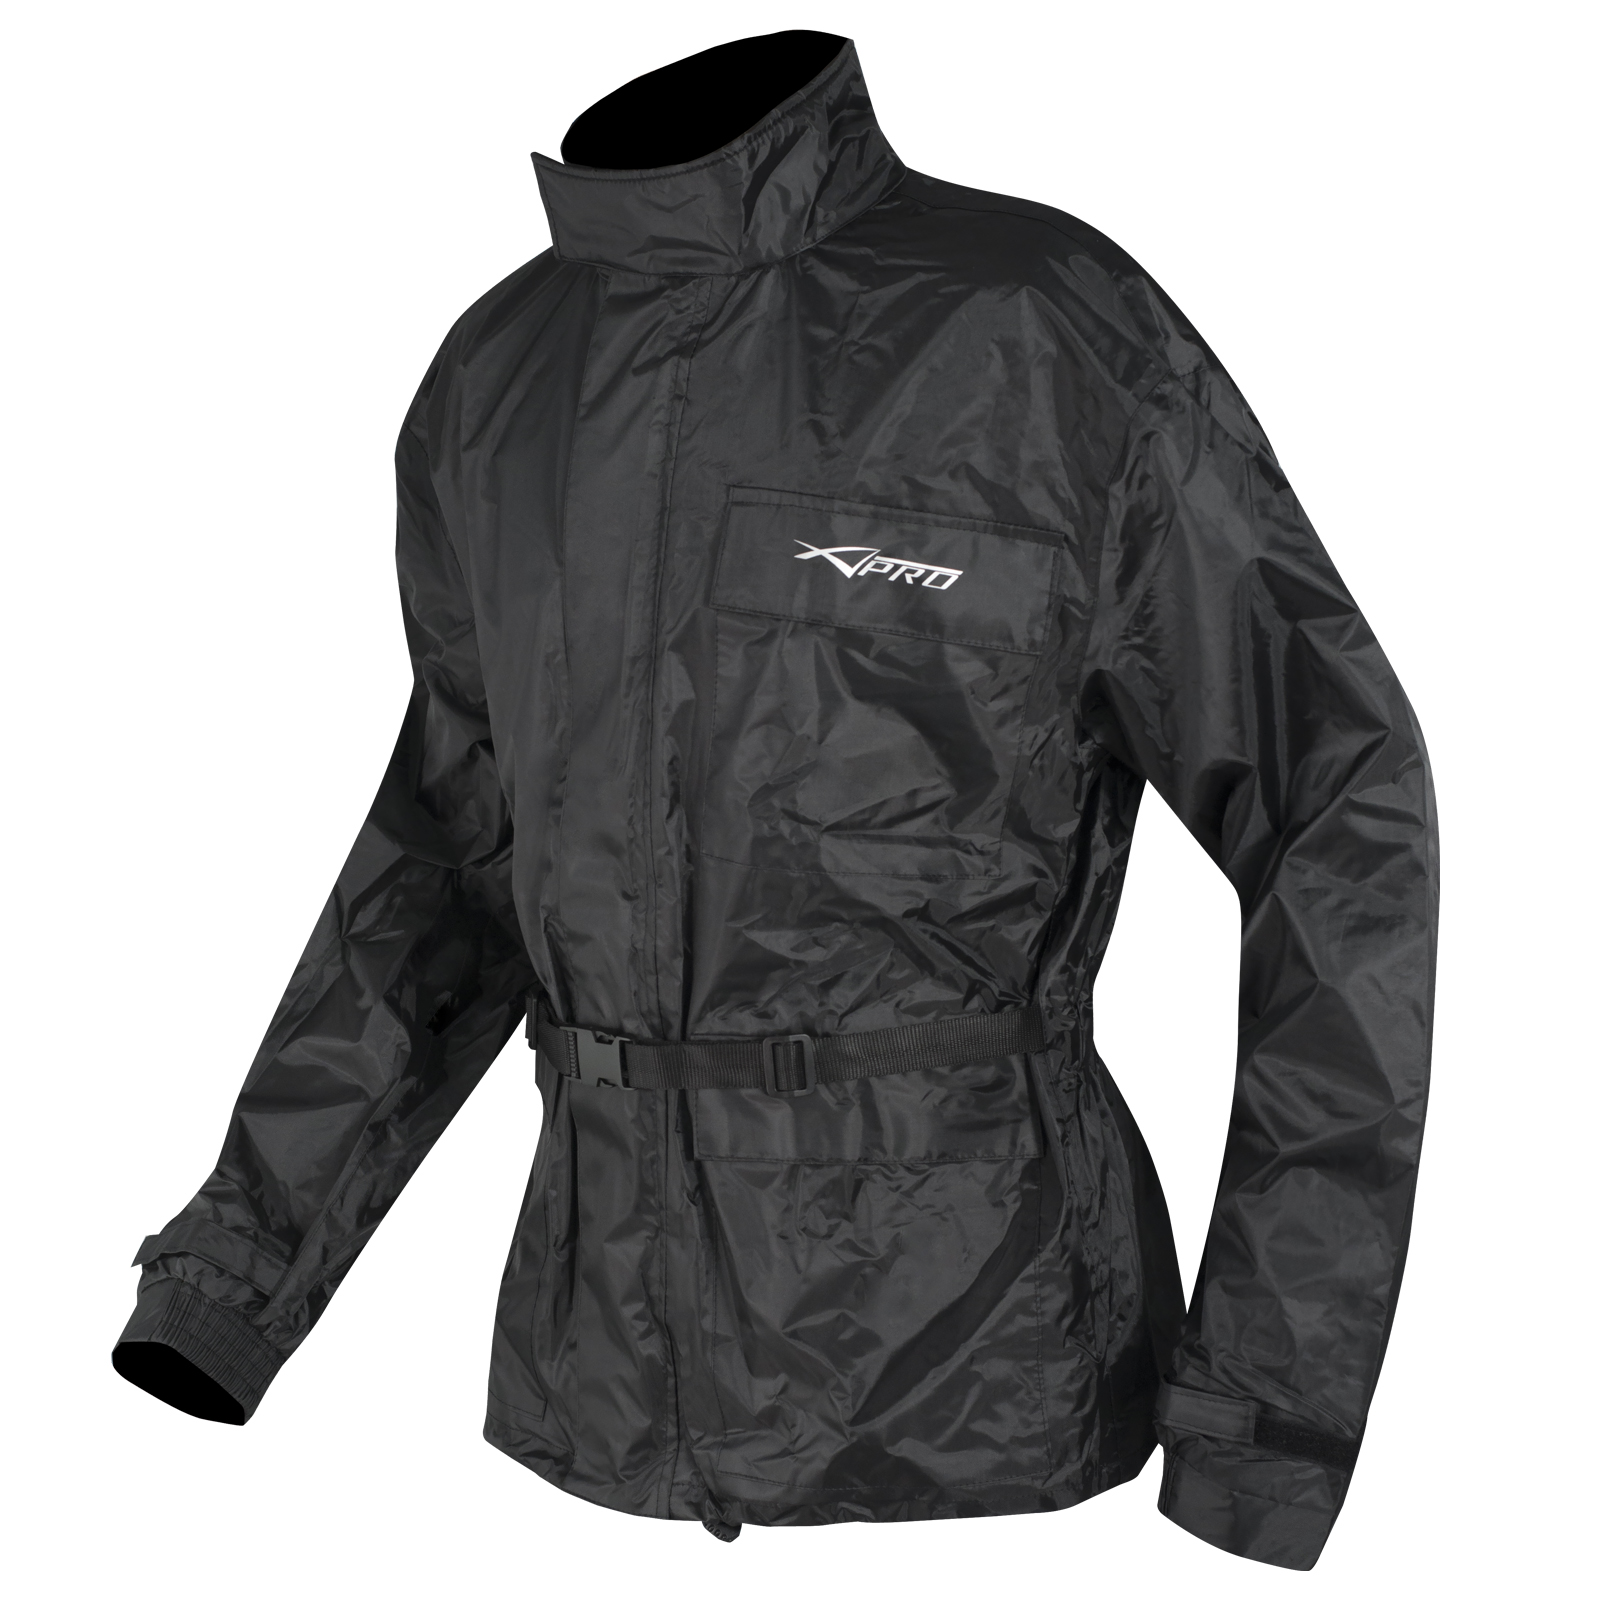 Combinaison-Textile-Impermeable-Anti-Pluie-Blouson-Pantalon-Moto-Motard-Touring